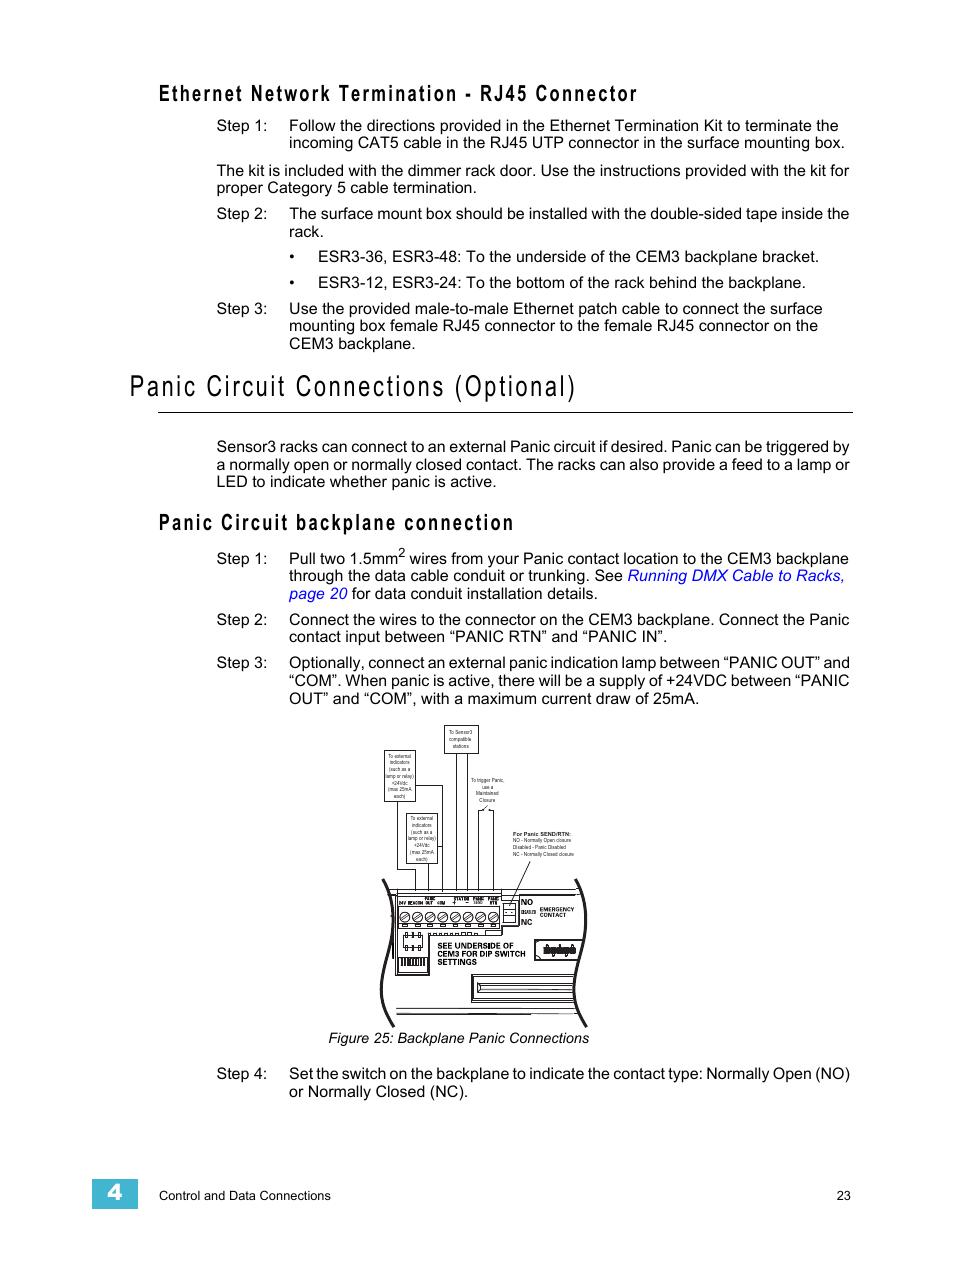 Autowatch 674 ri wiring diagram